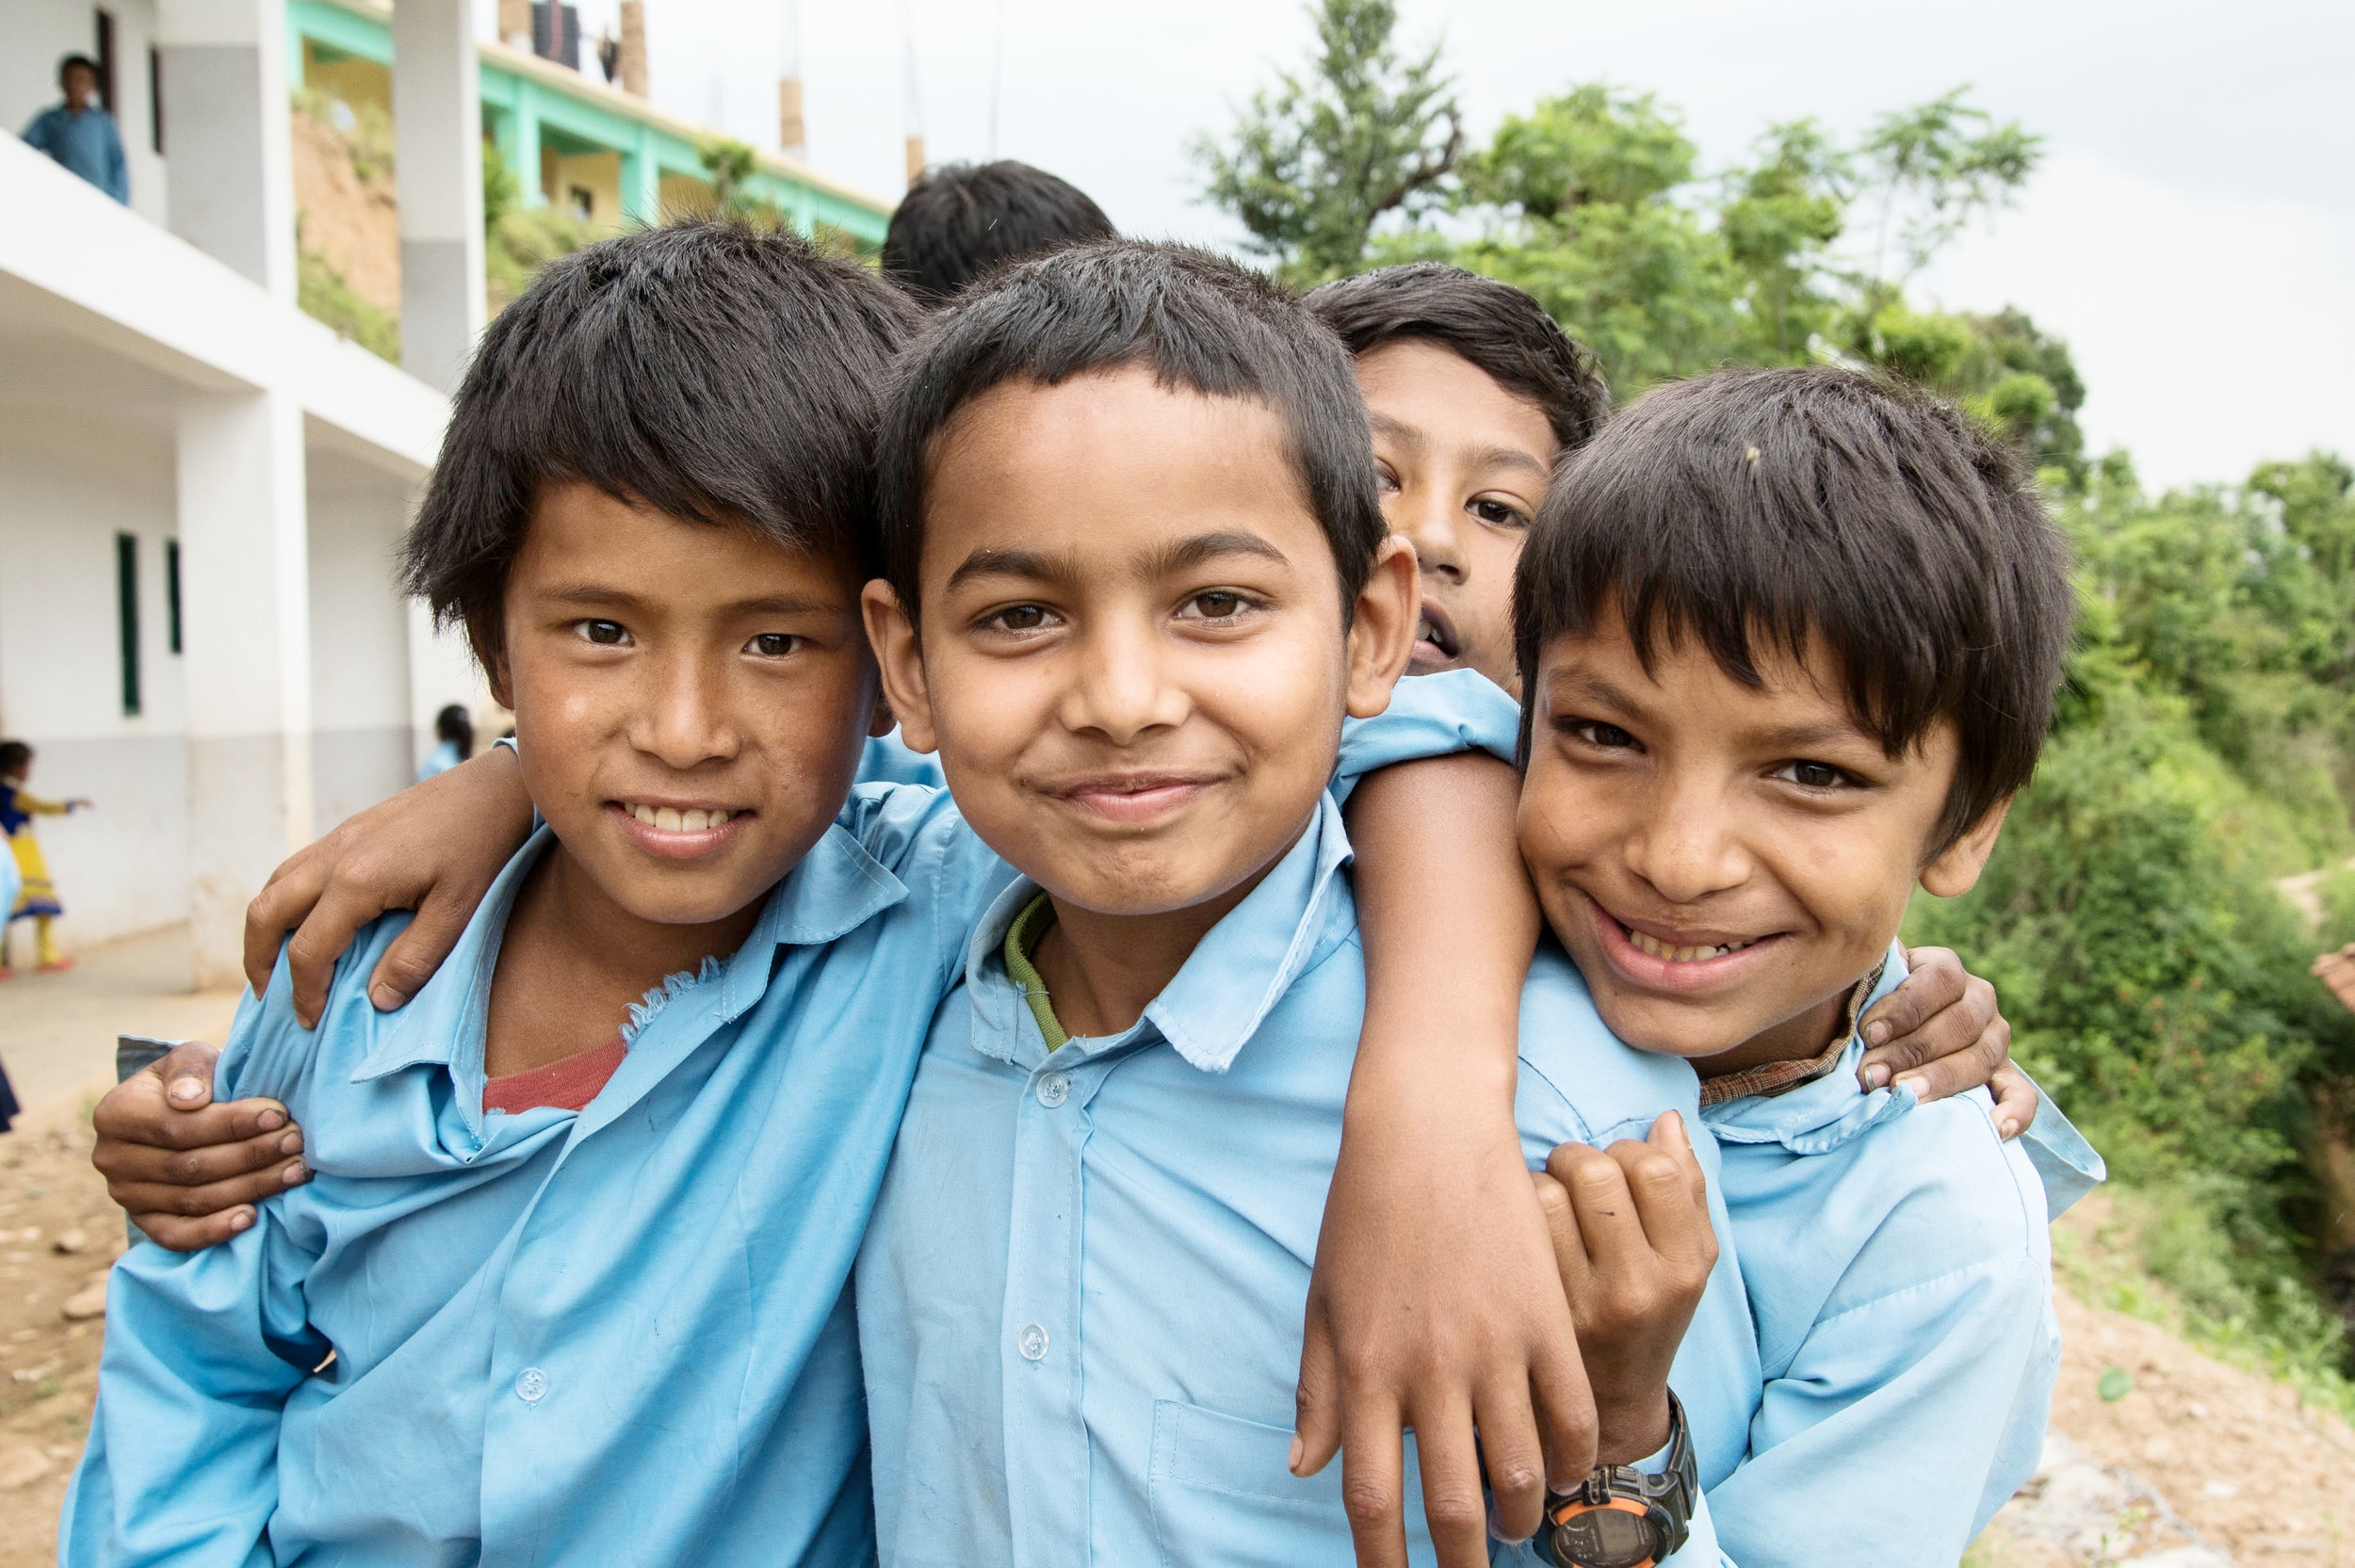 Nepal 2017 Seto Lg 1956.jpg